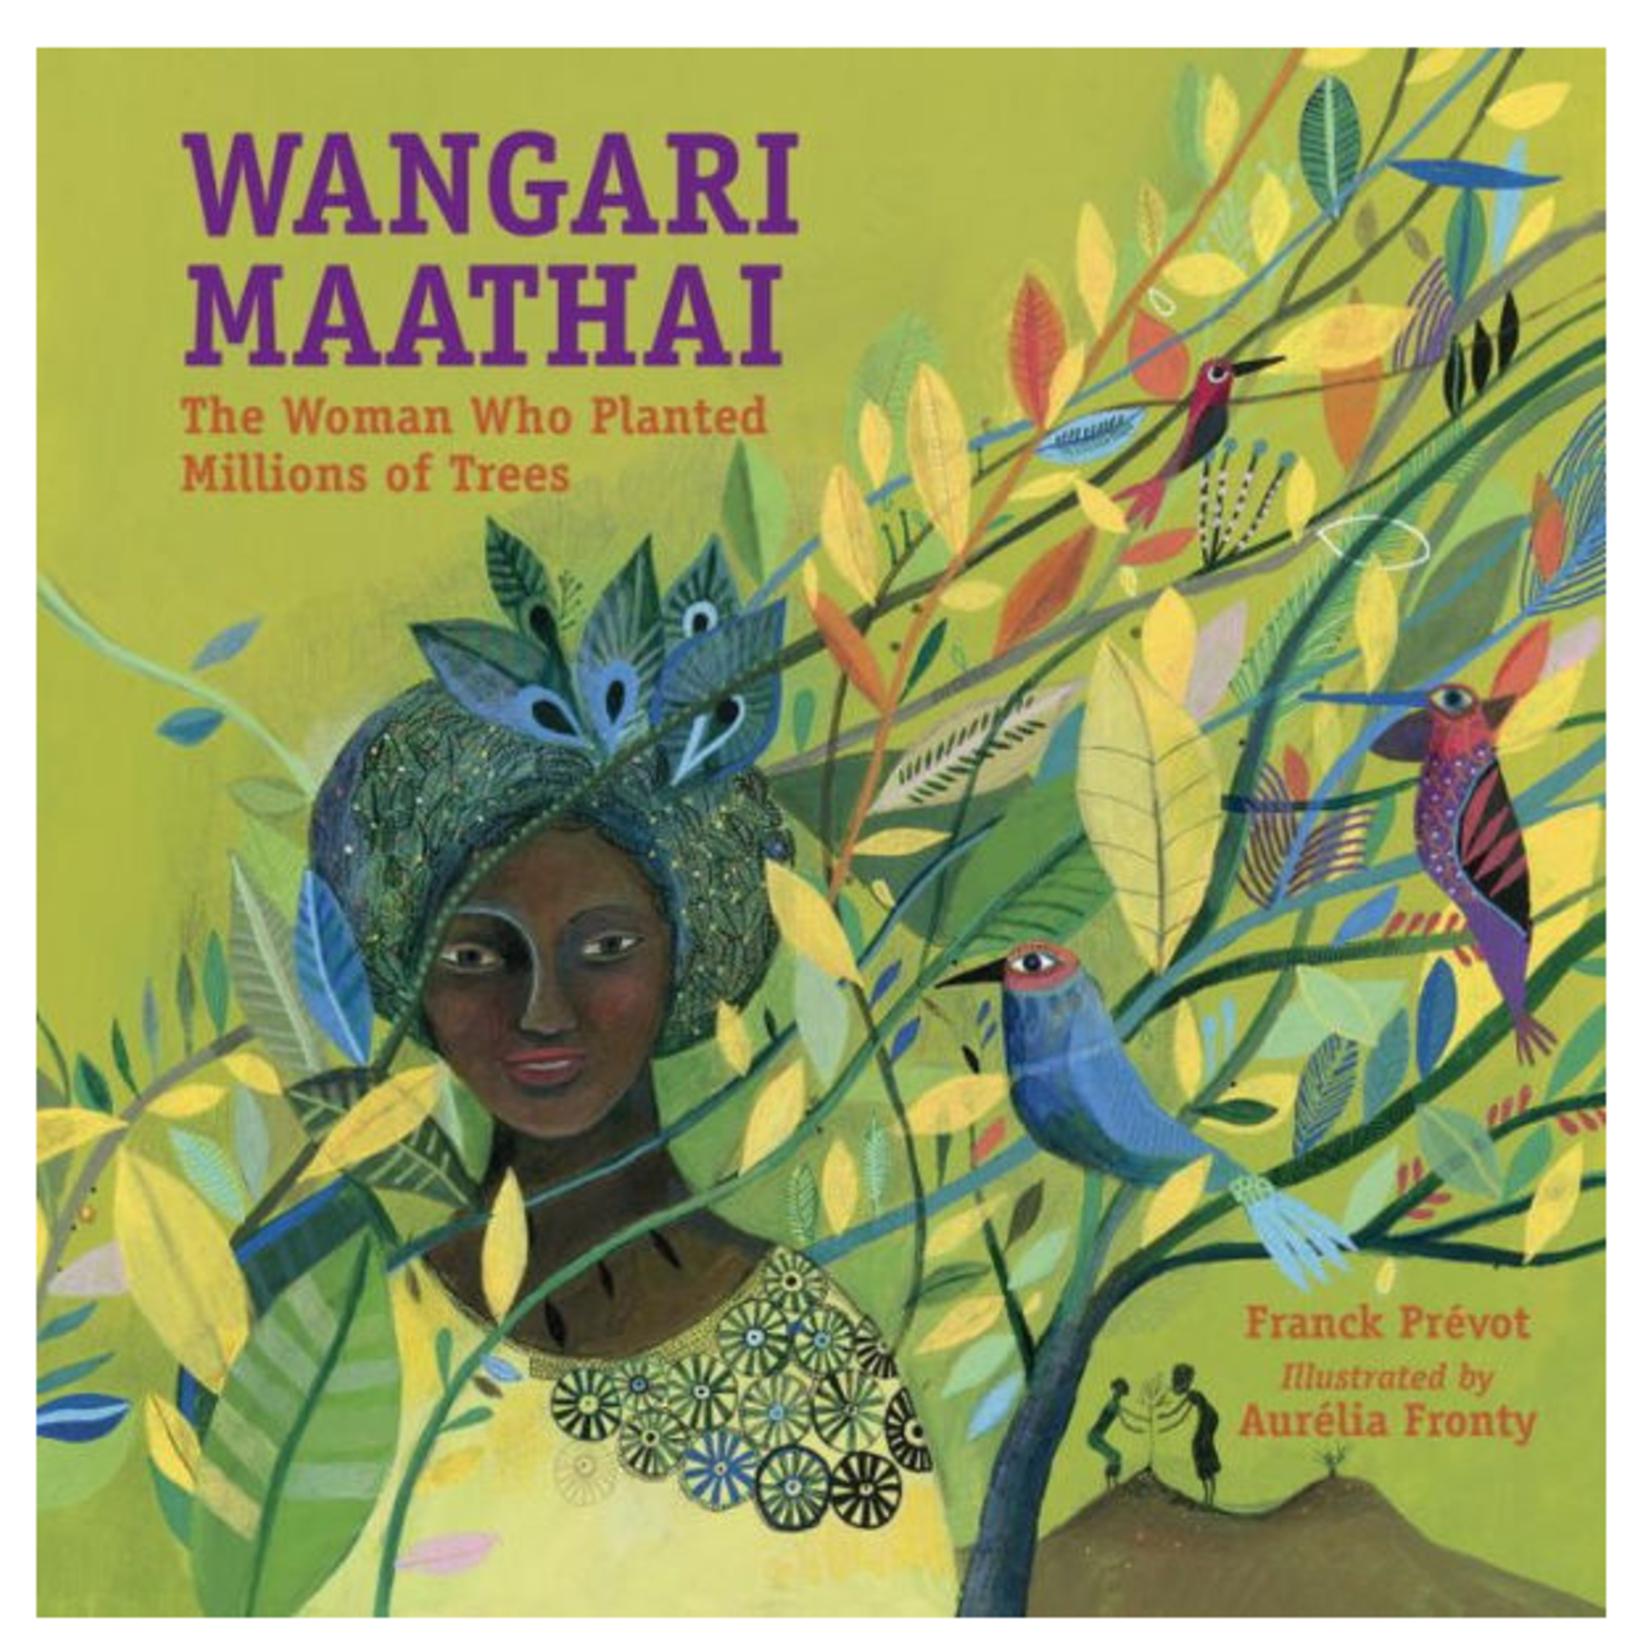 Wangari Maathai, The Woman Who Planted Millions of Trees